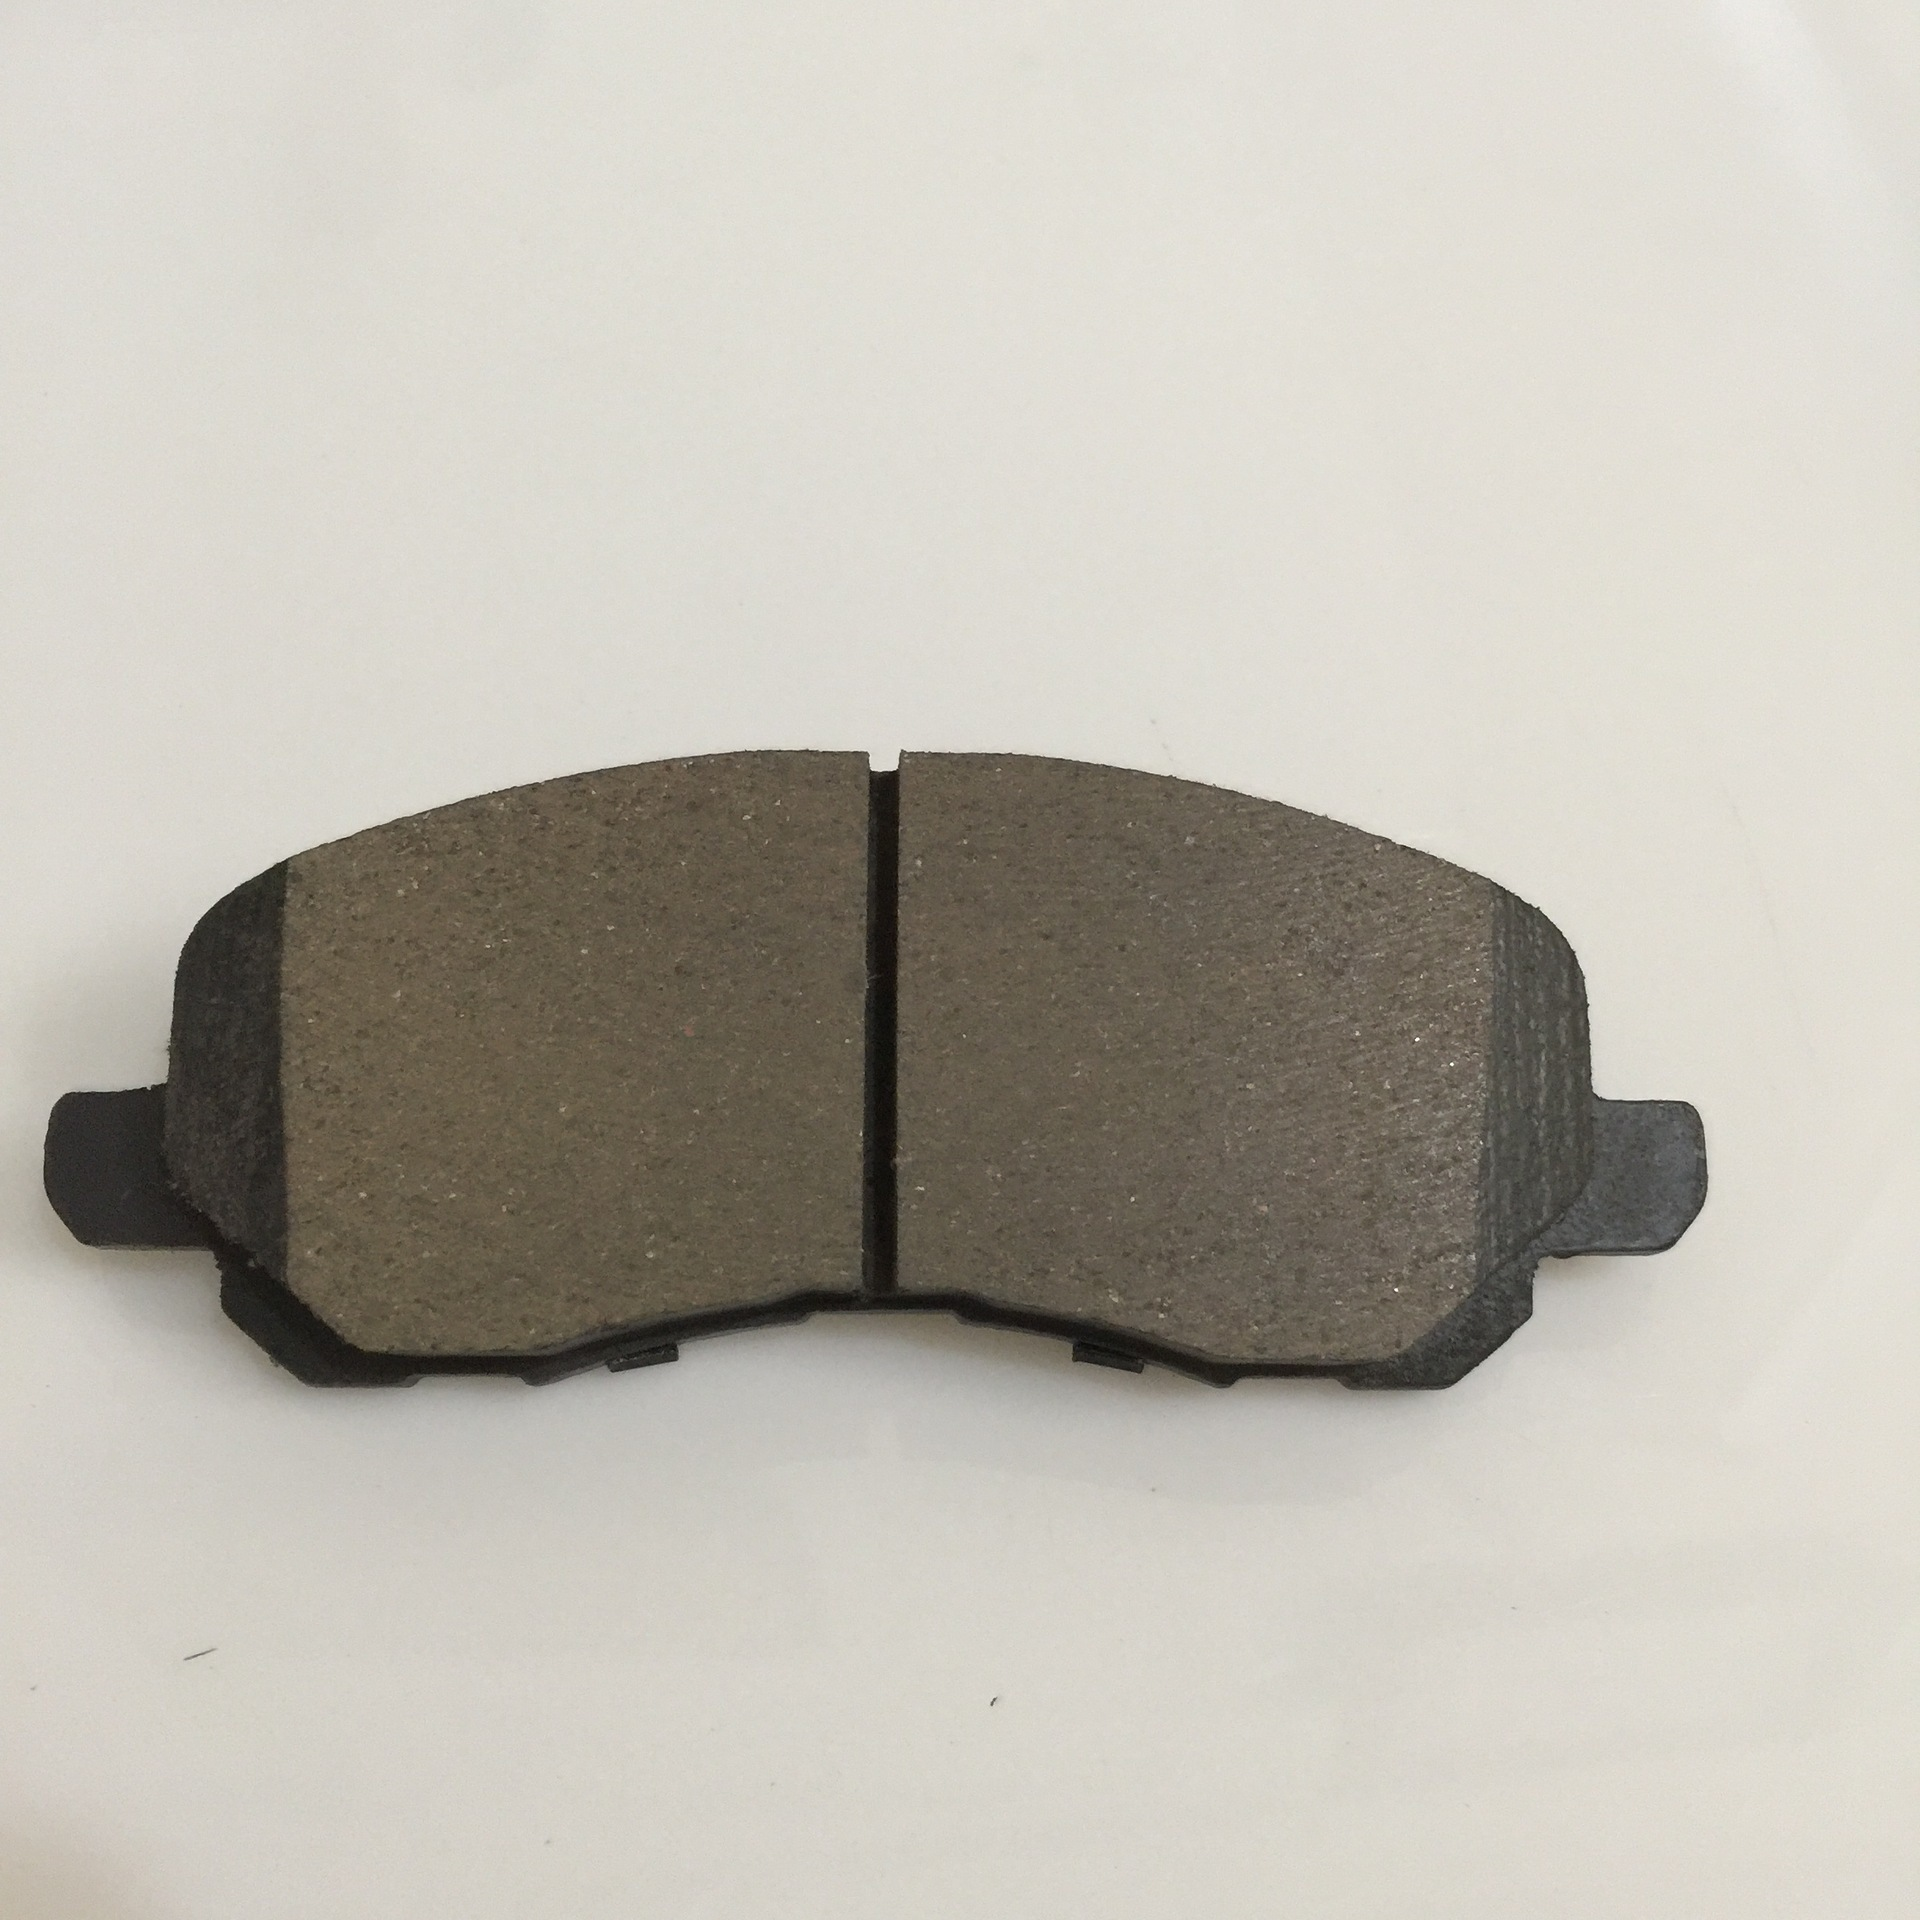 Premium Ceramic Disc Brake Pad REAR Fits Caliber Mitsubishi Outlander KFE1037